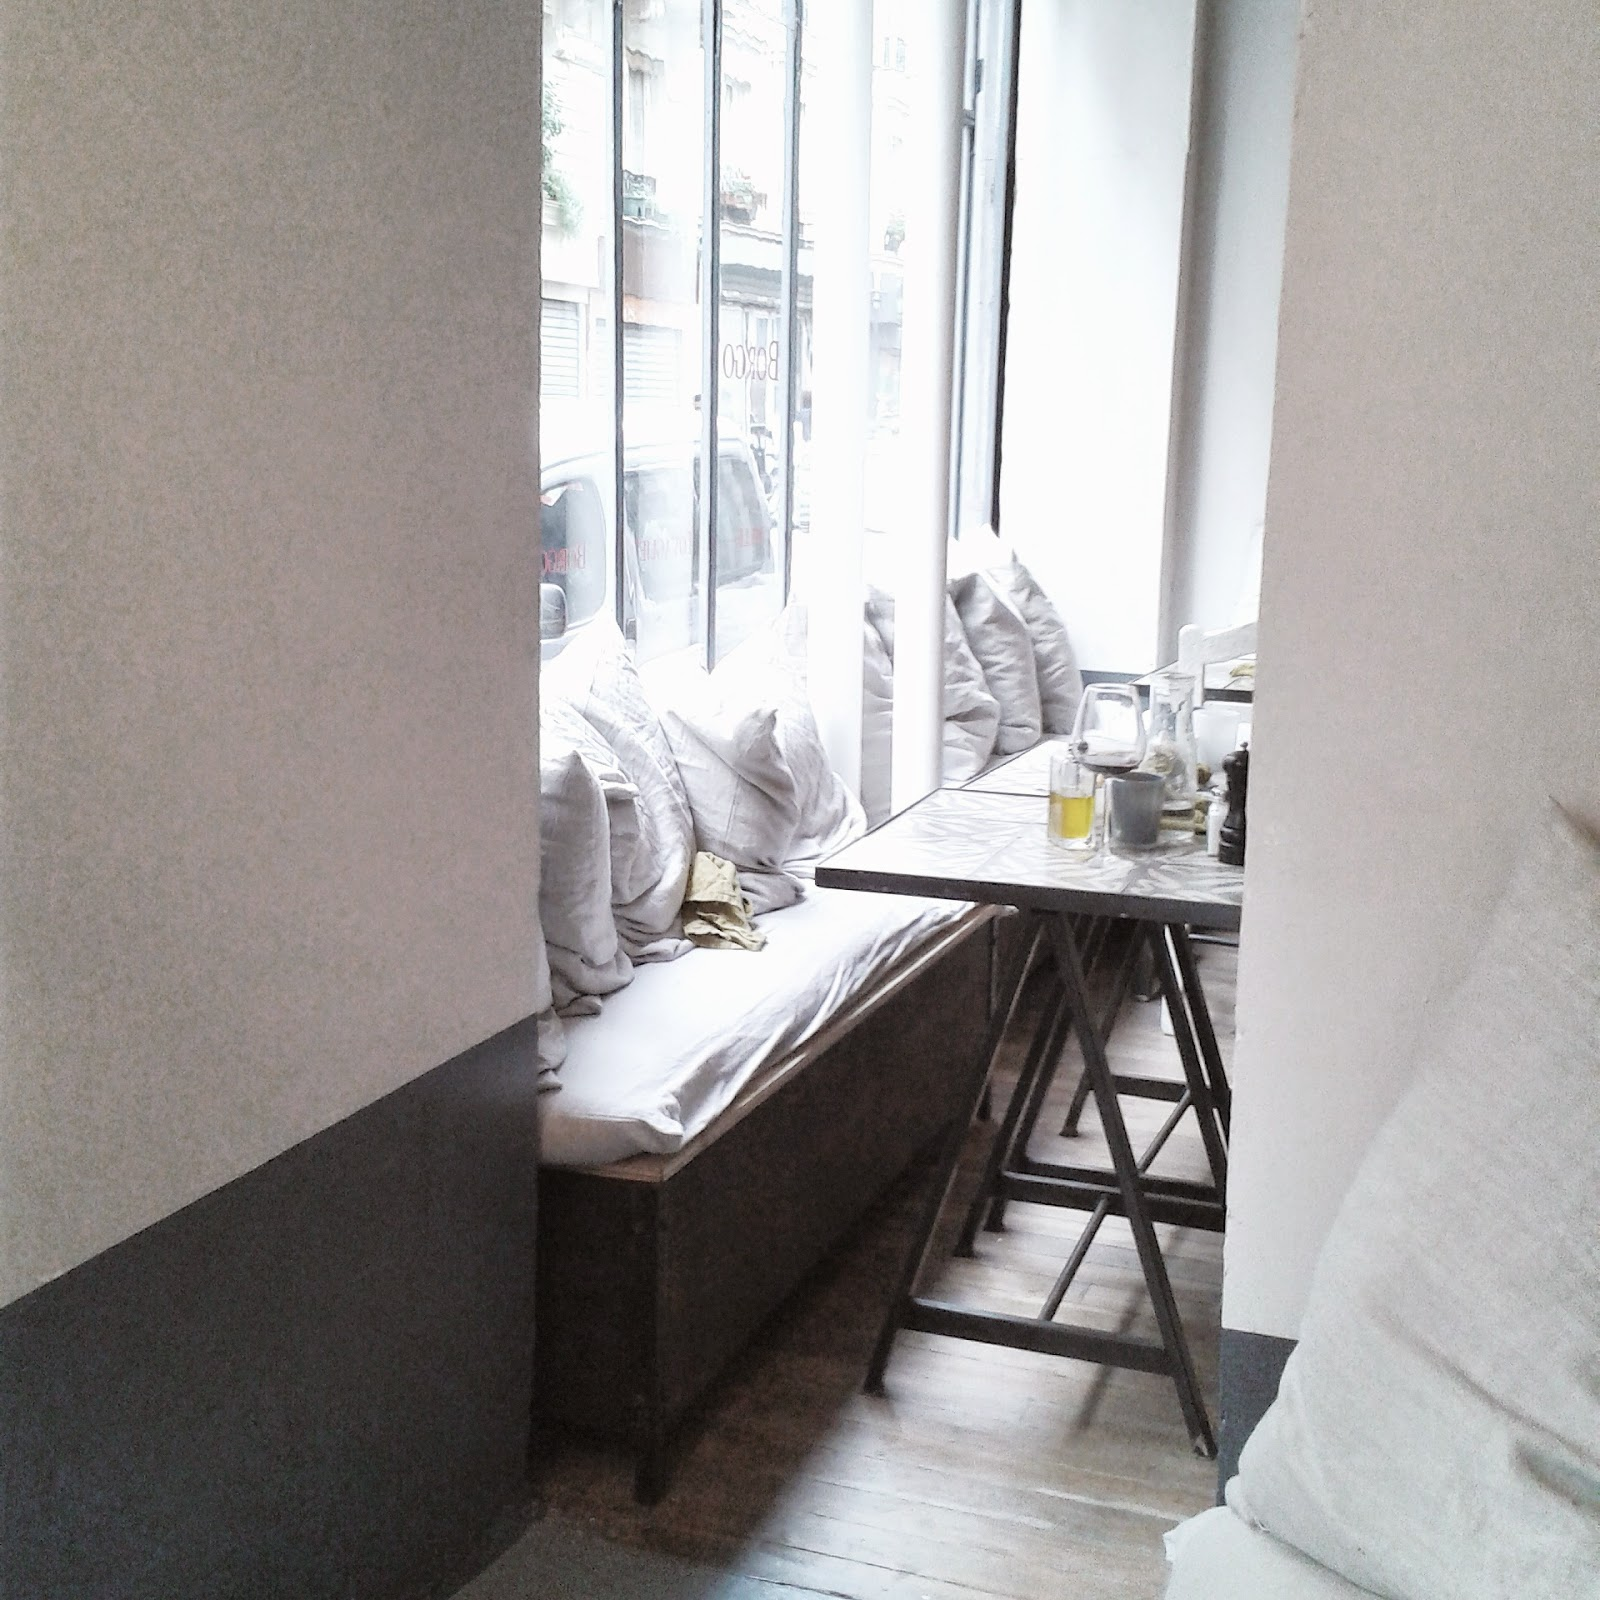 Crédit Photo Atelier rue verte / Borgo Delle Tovaglie /